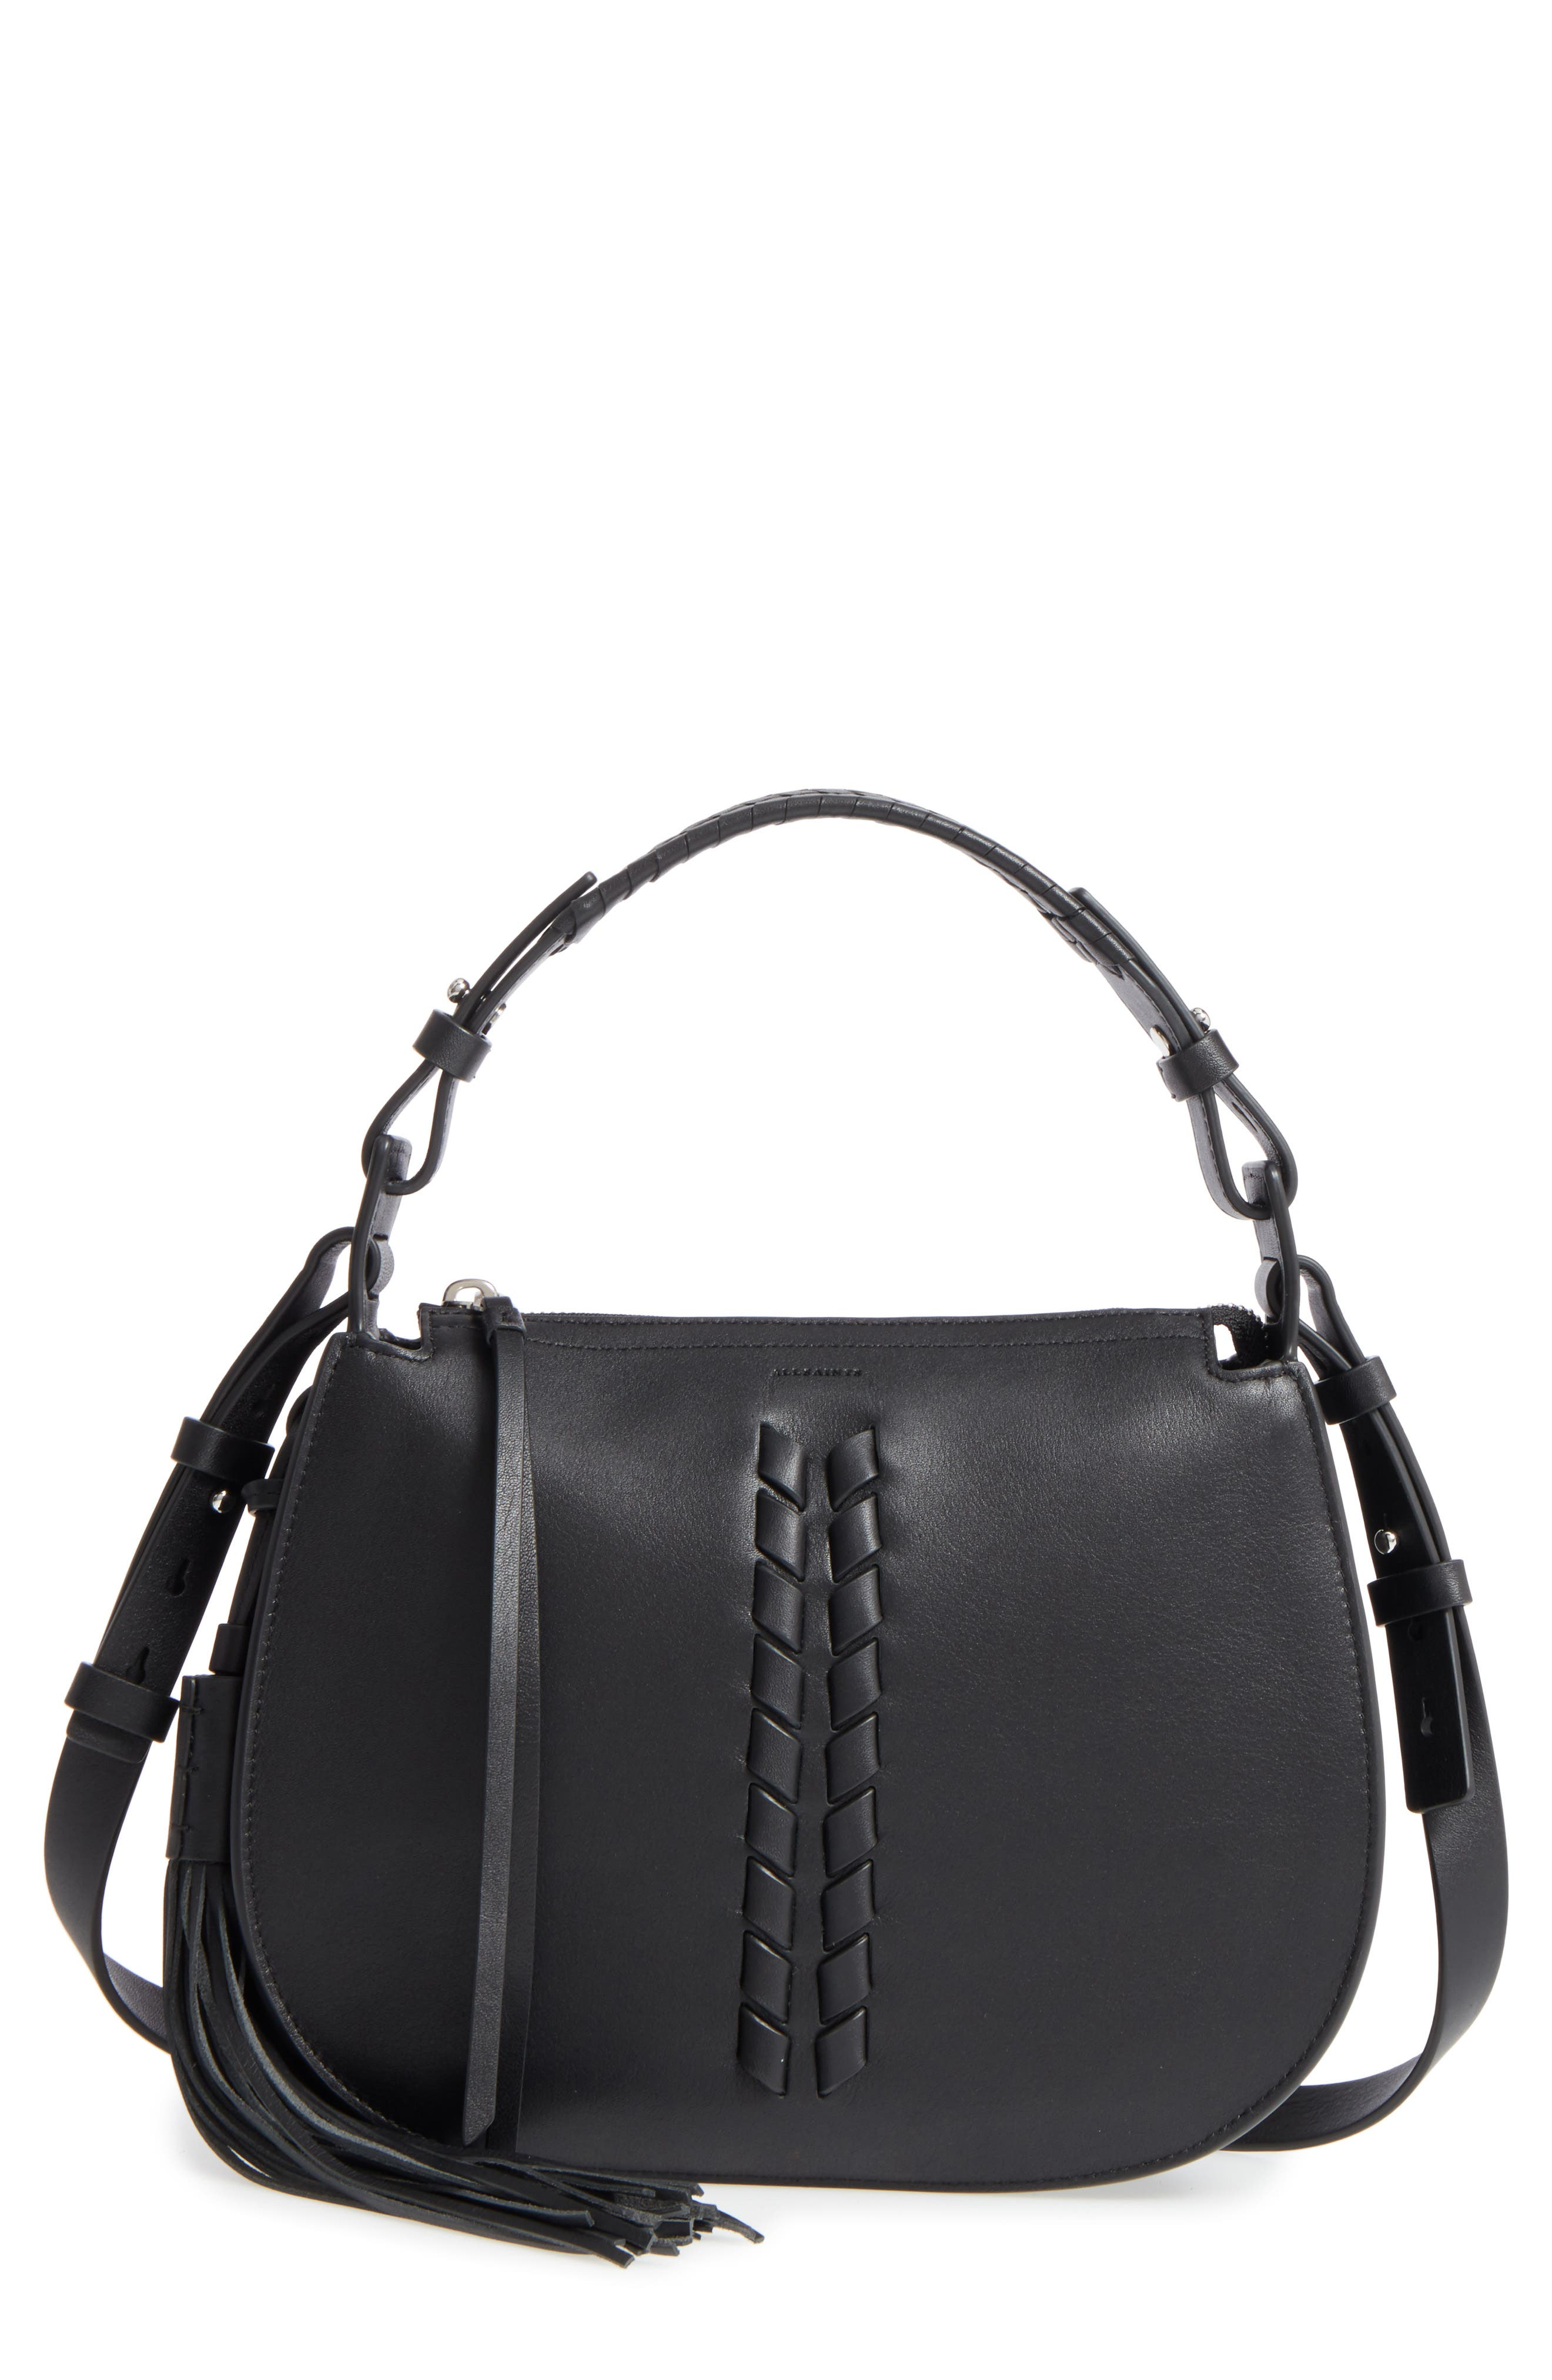 ALLSAINTS Kepi Leather Crossbody Bag